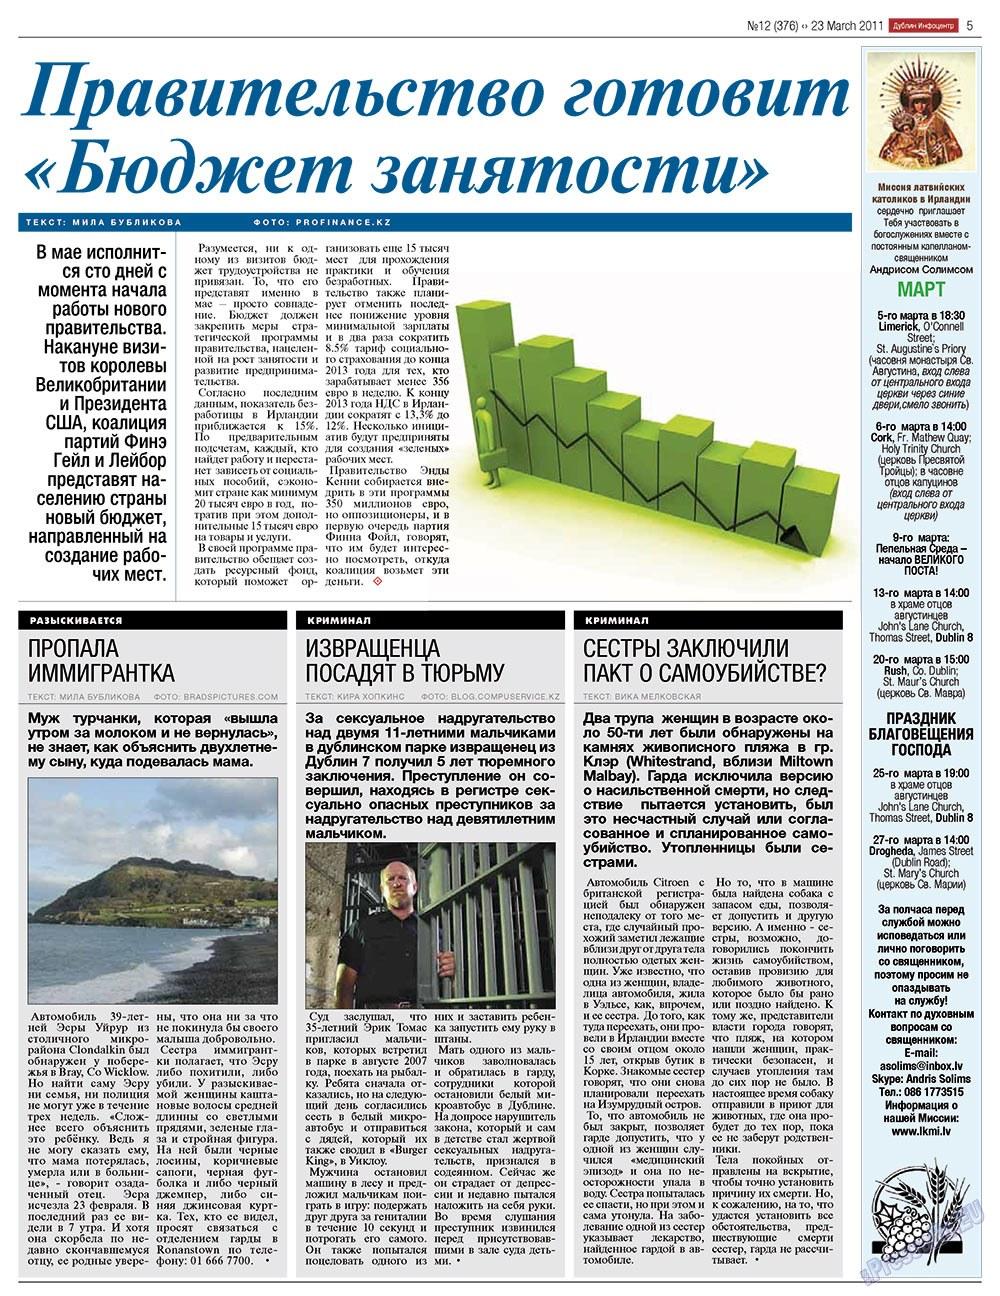 Дублин инфоцентр (газета). 2011 год, номер 12, стр. 5